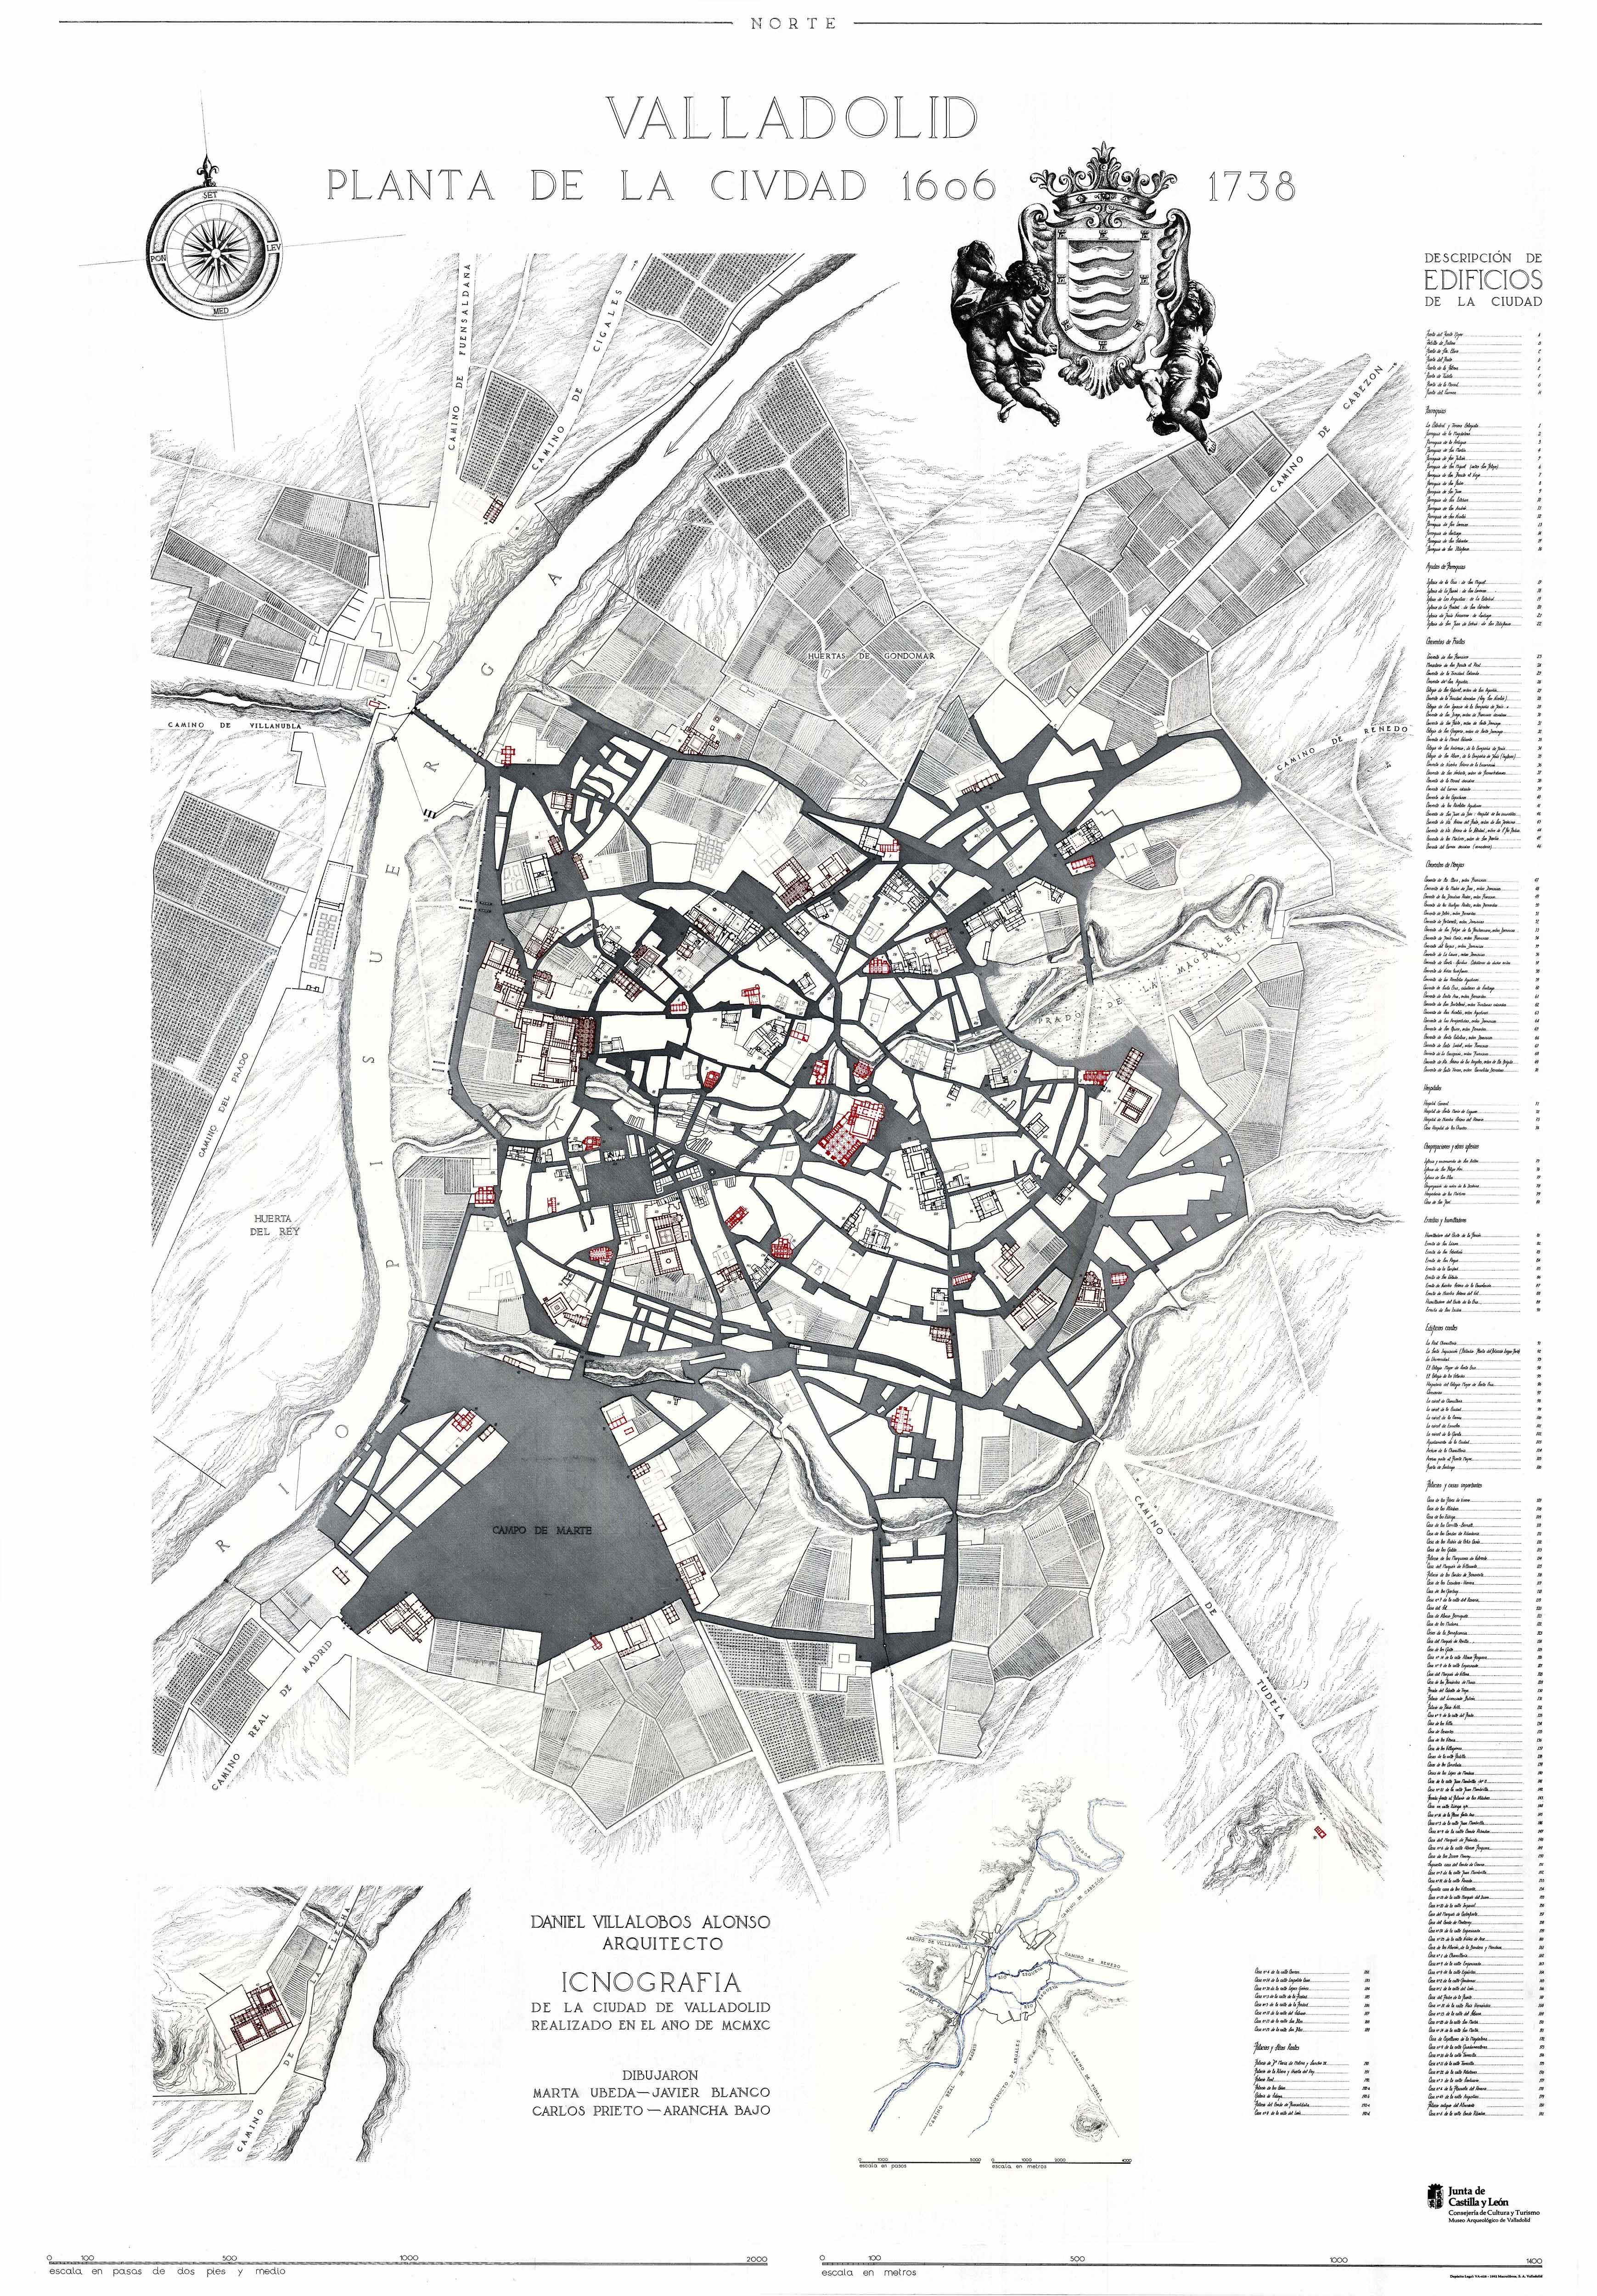 danielvillalobos-valladolid-blueprints-renaissance-2